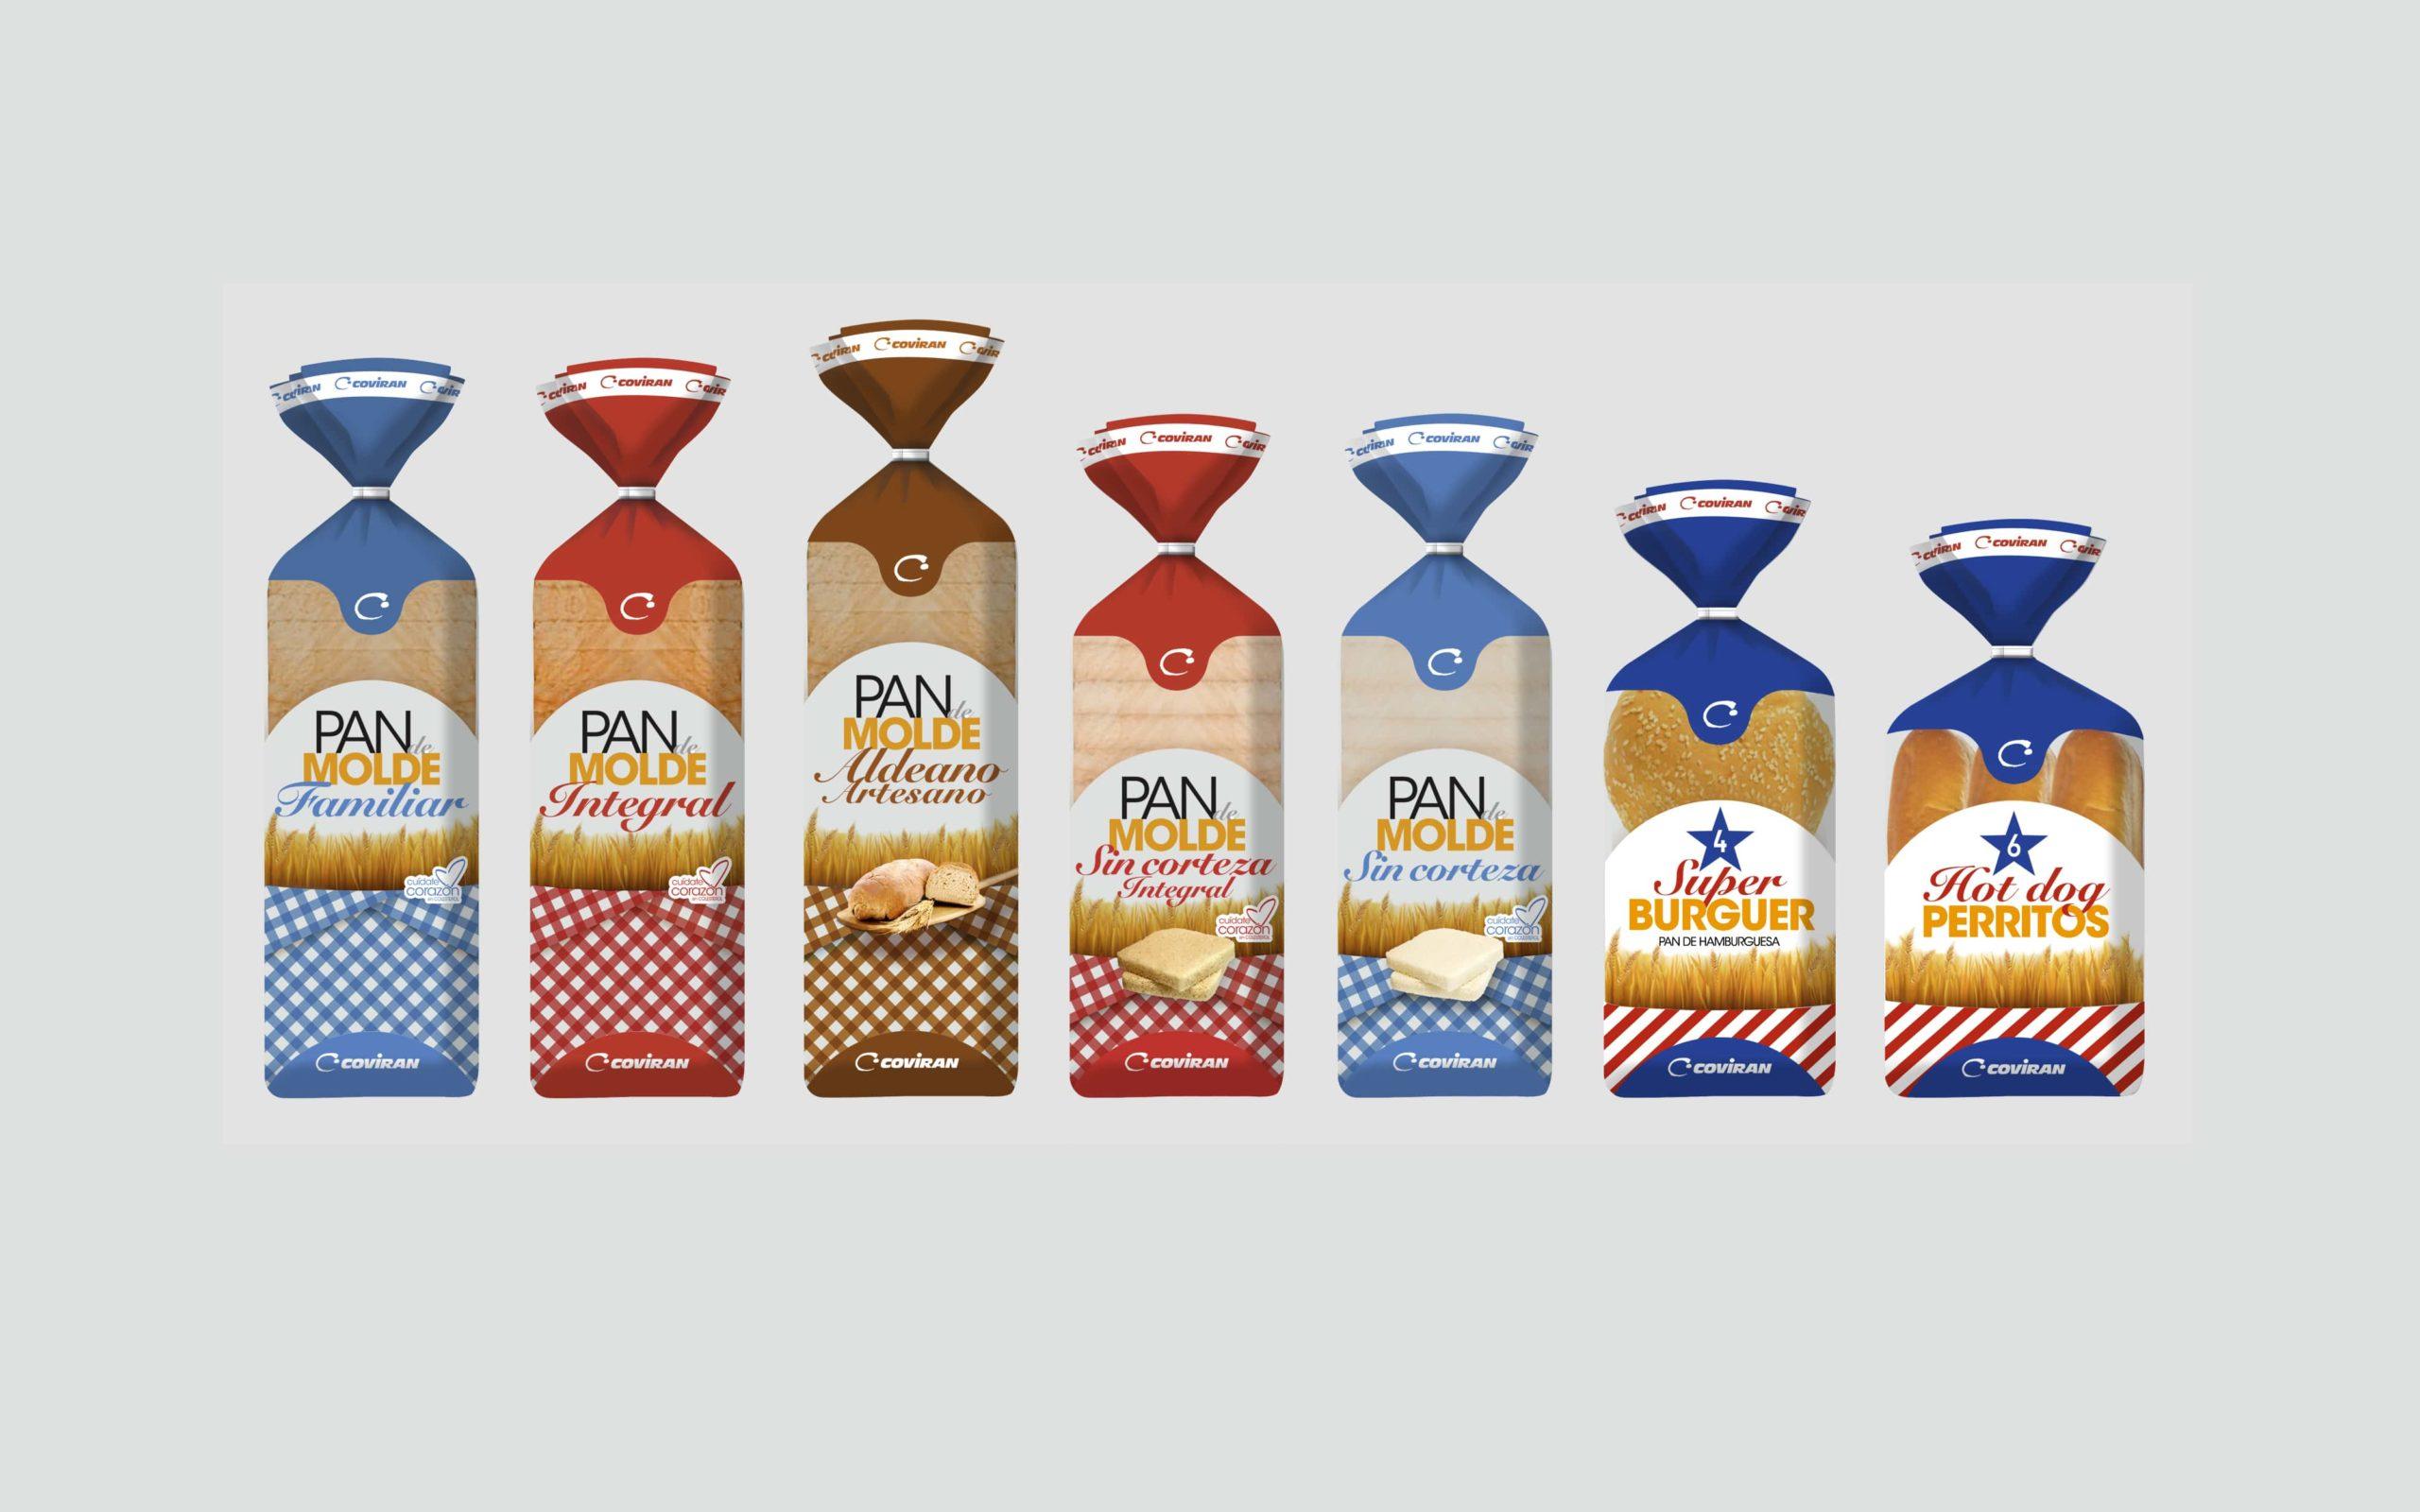 diseno-packaging-coviran-pan-de-molde-min